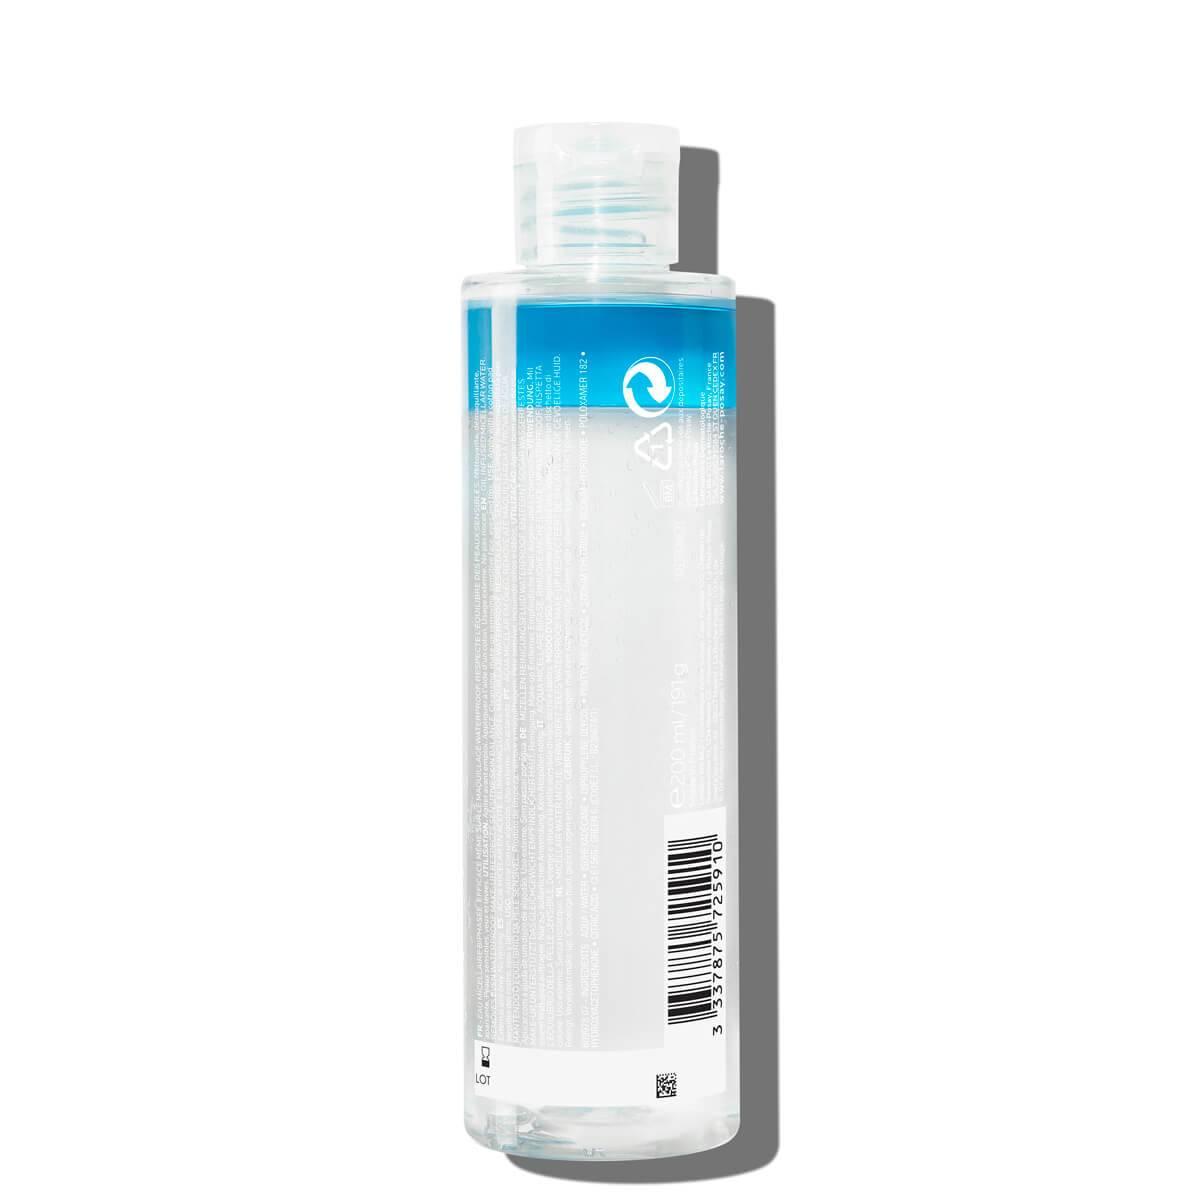 LaRochePosay-Produkt-Oblicej-Fyziologicky-Olej-Obohaceny-Micelarni-Vodou-Ultra-200ml-3337875725910-BSS